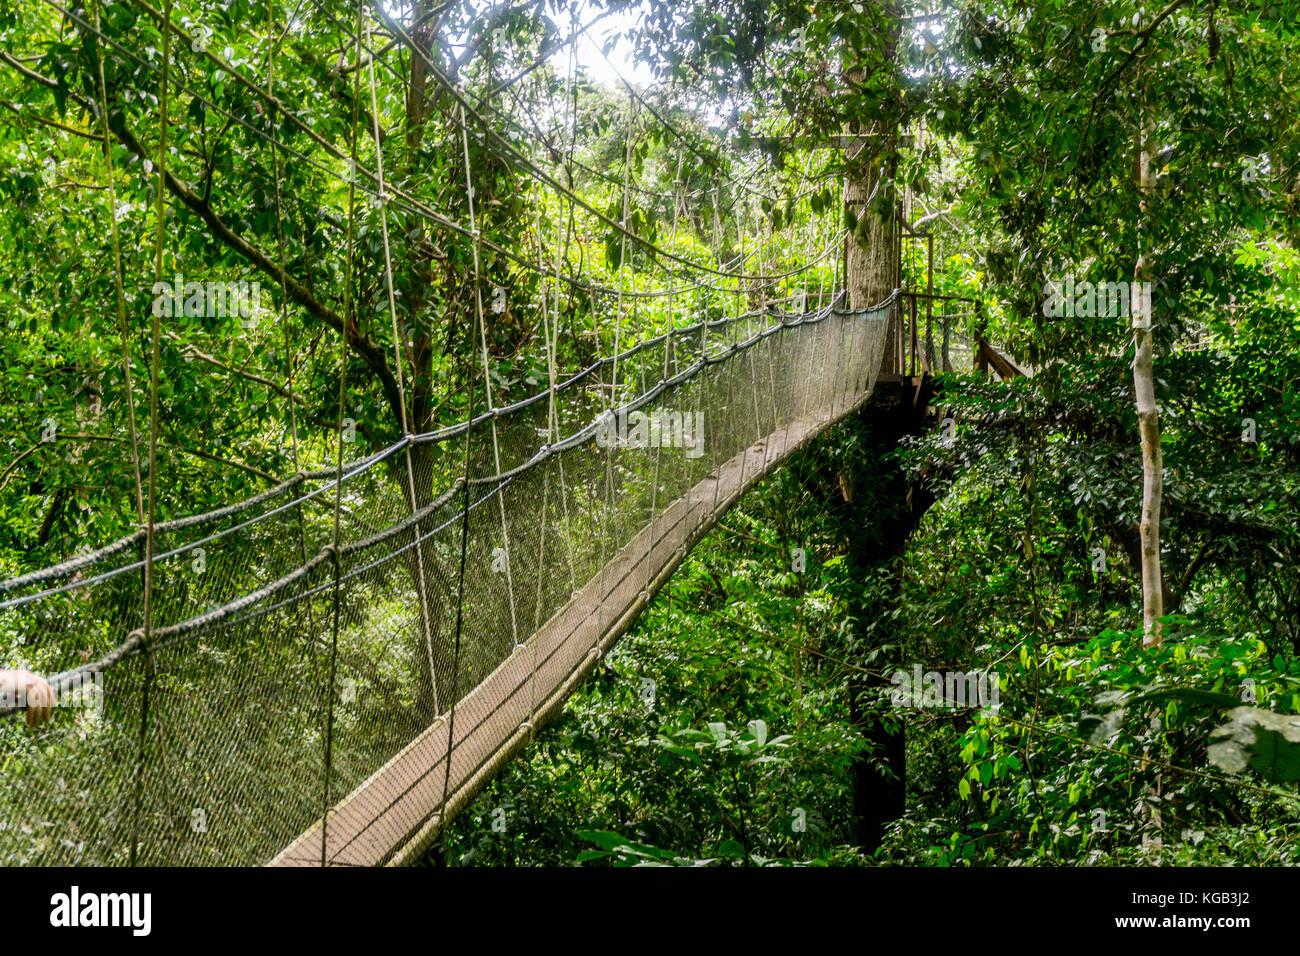 Mulu National Park - Canopy Walk & Mulu National Park - Canopy Walk Stock Photo Royalty Free Image ...